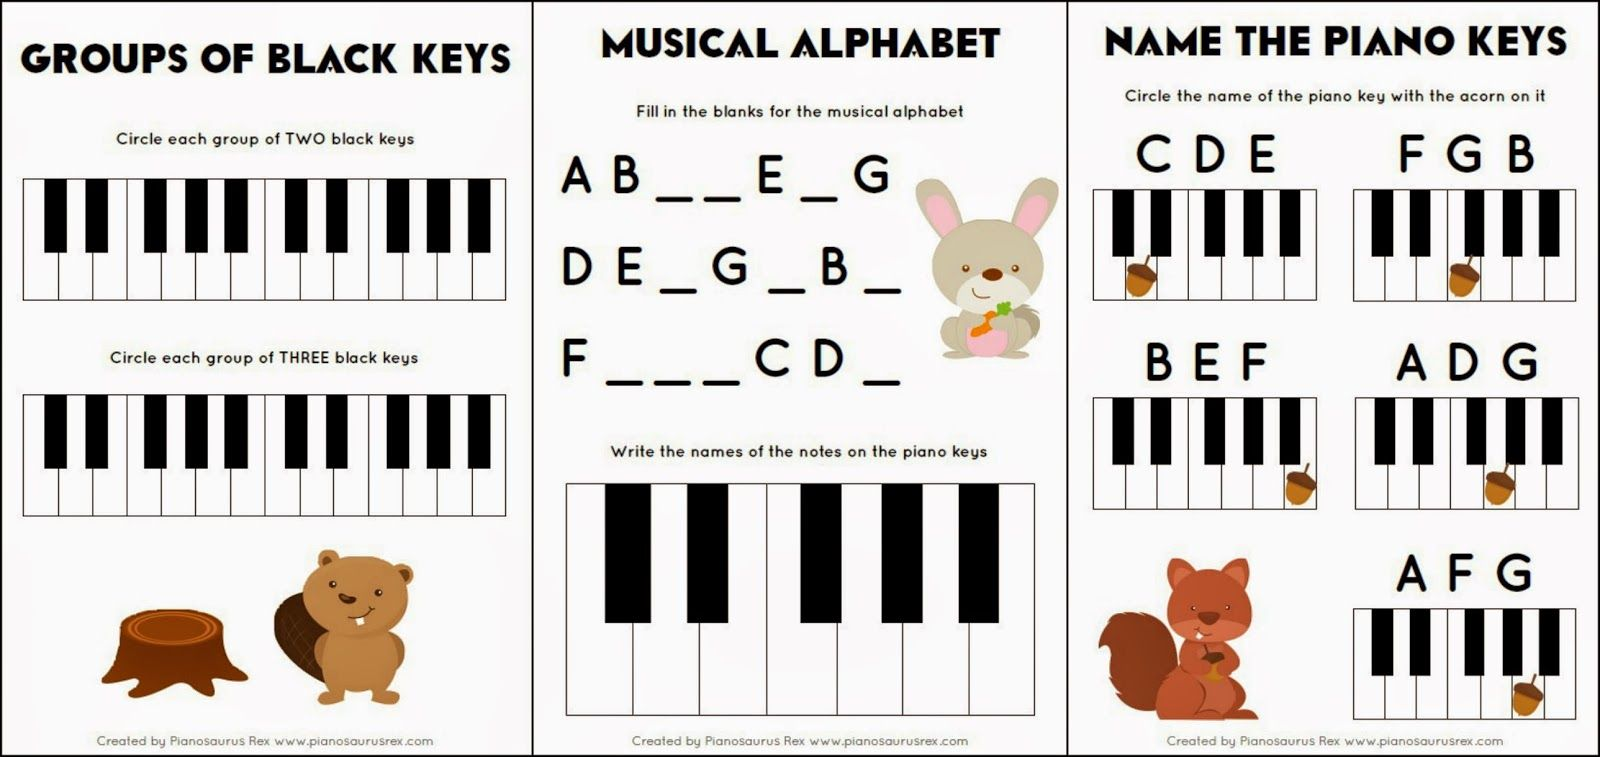 Pianosaurus Rex Free Music Worksheets For Ipad Free Music Worksheets Music Worksheets Teaching Music Theory